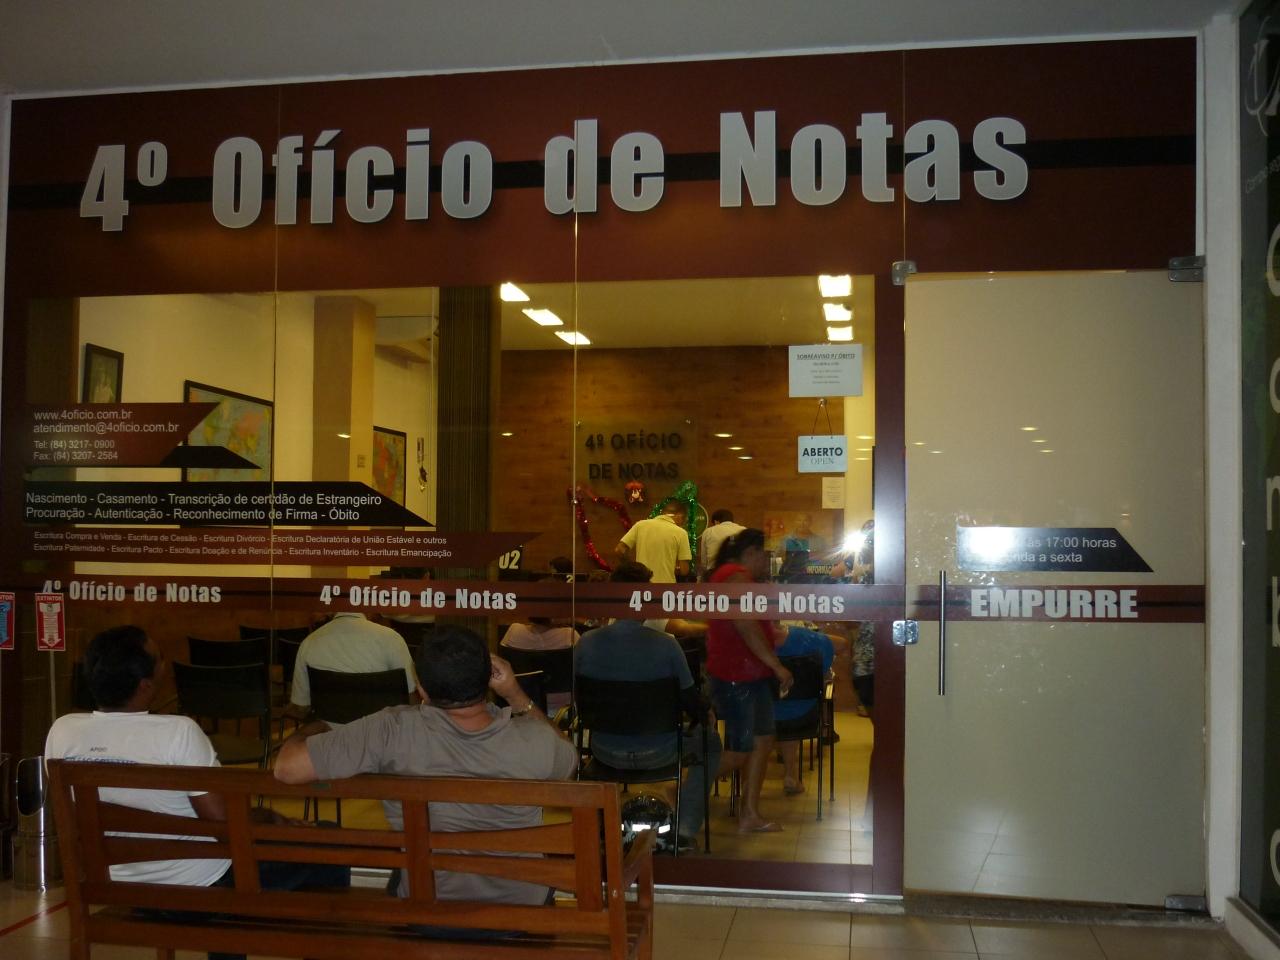 Bresil insolite u2013 office de notaire passion bresil